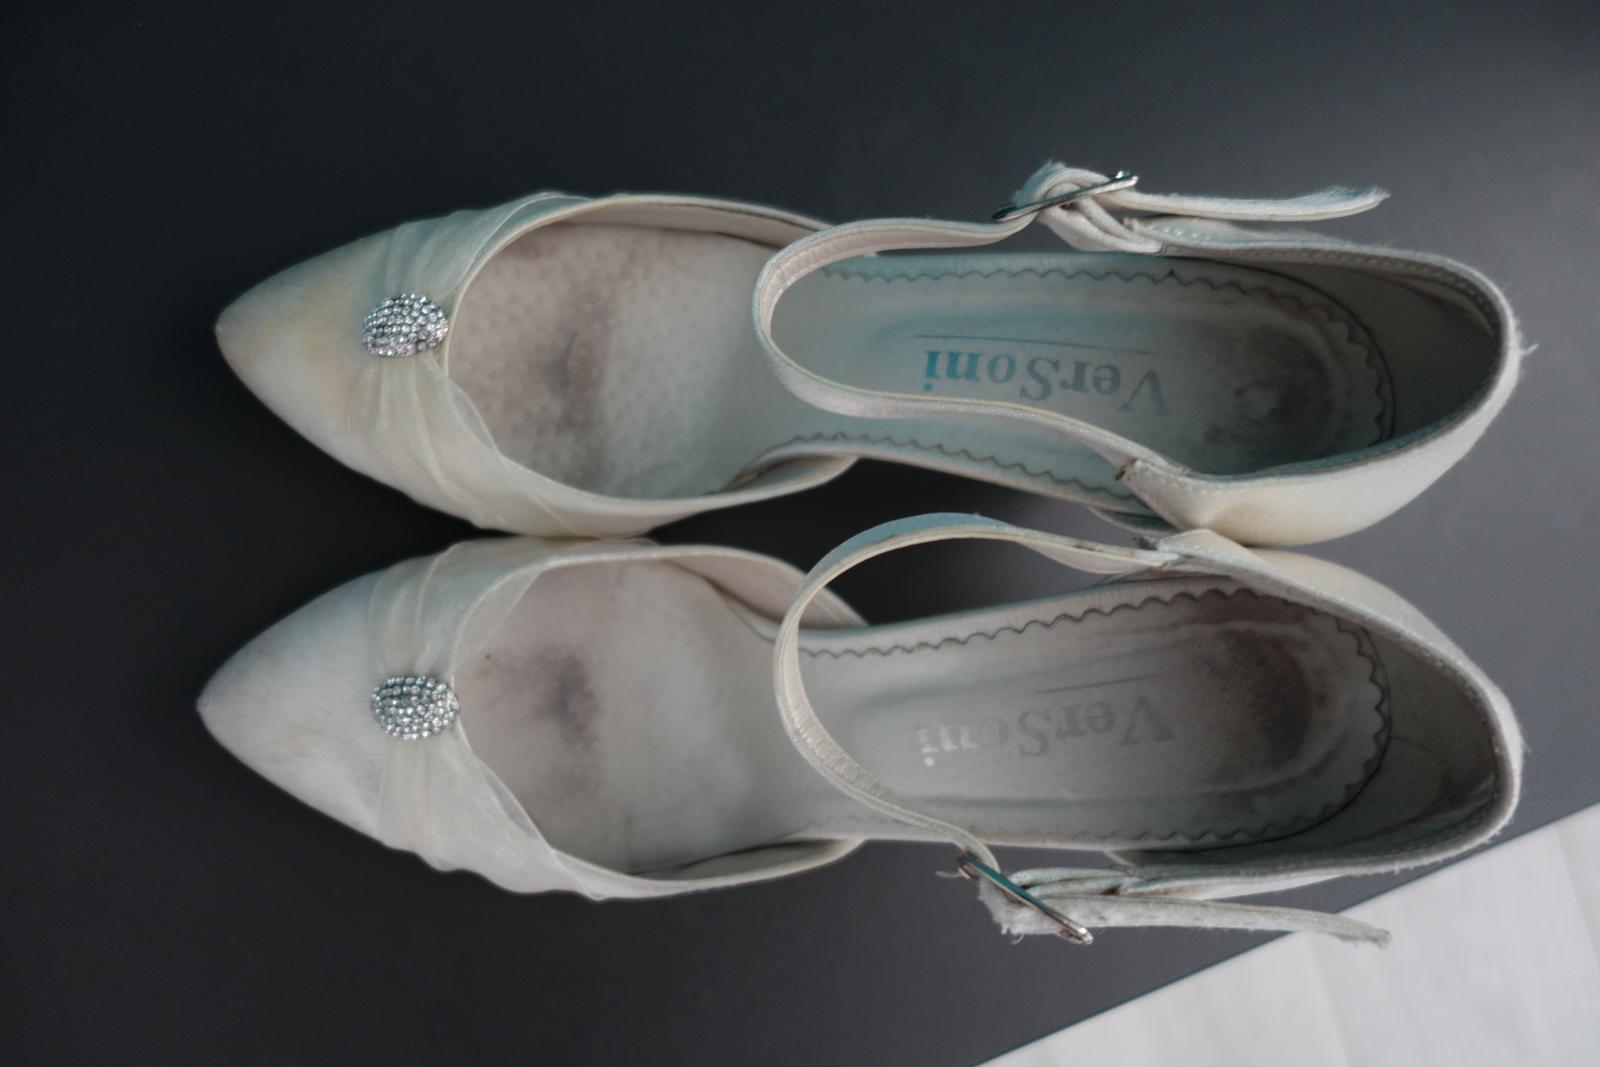 Svadobné/spoločenské topánky č. 40 - 41 - Obrázok č. 2